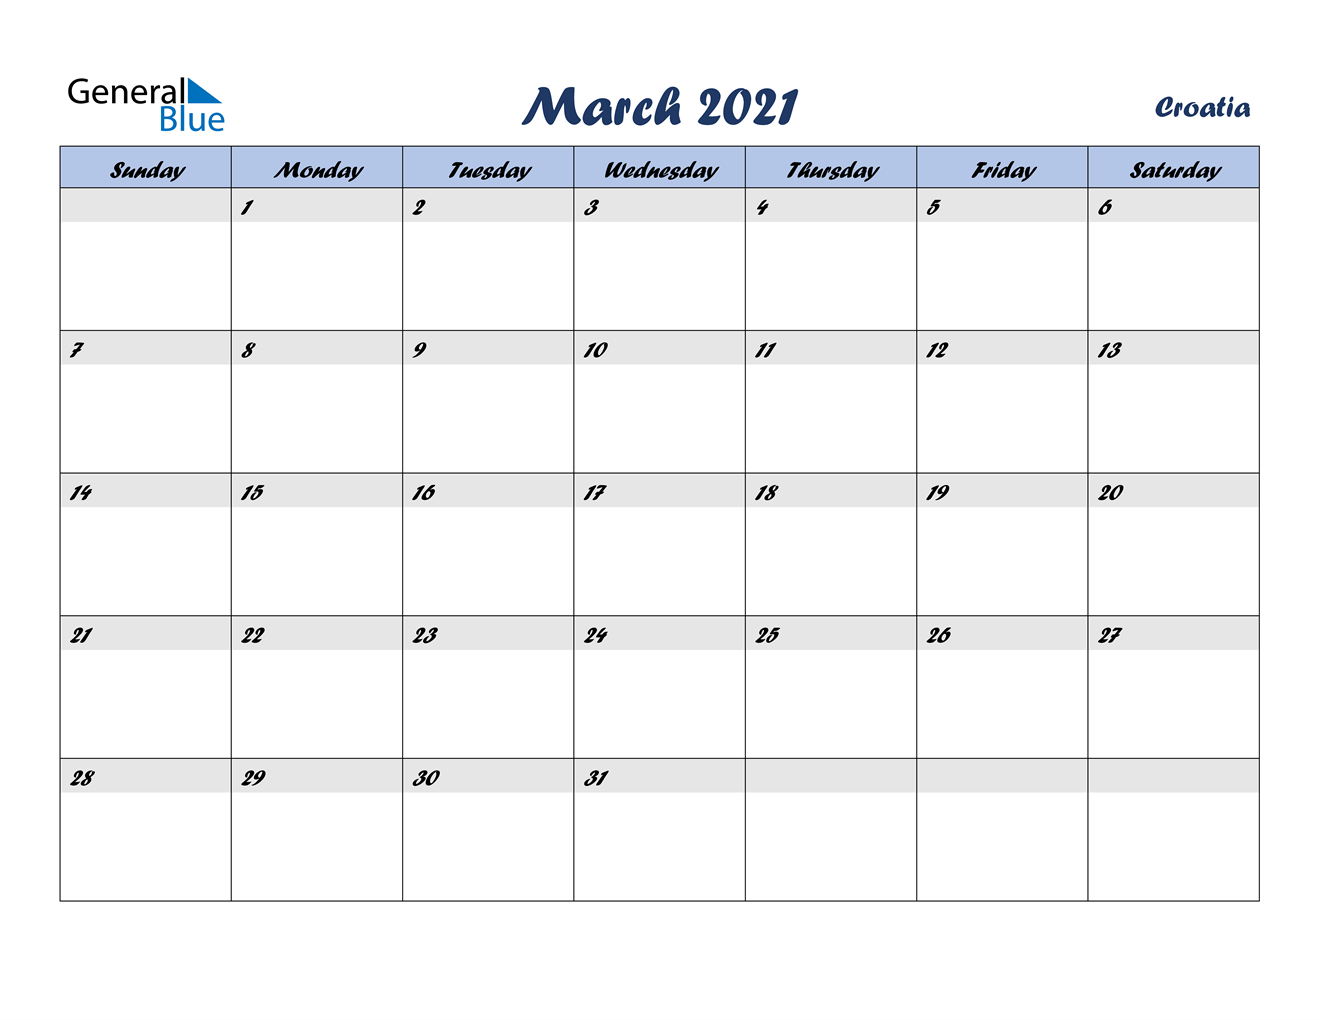 March 2021 Calendar - Croatia